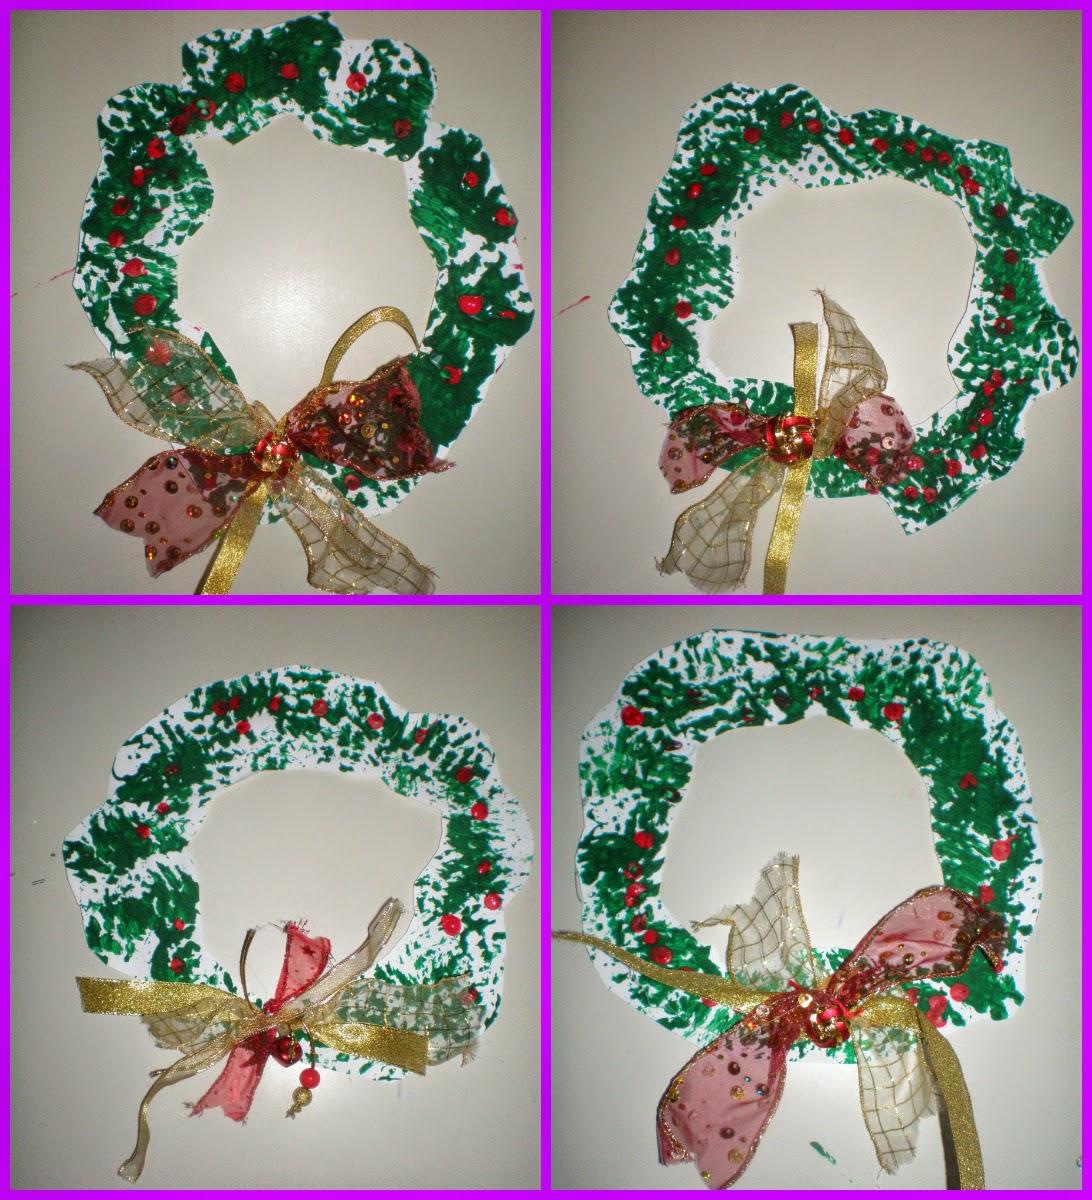 christmas-wreath-craft-idea-for-kids-1